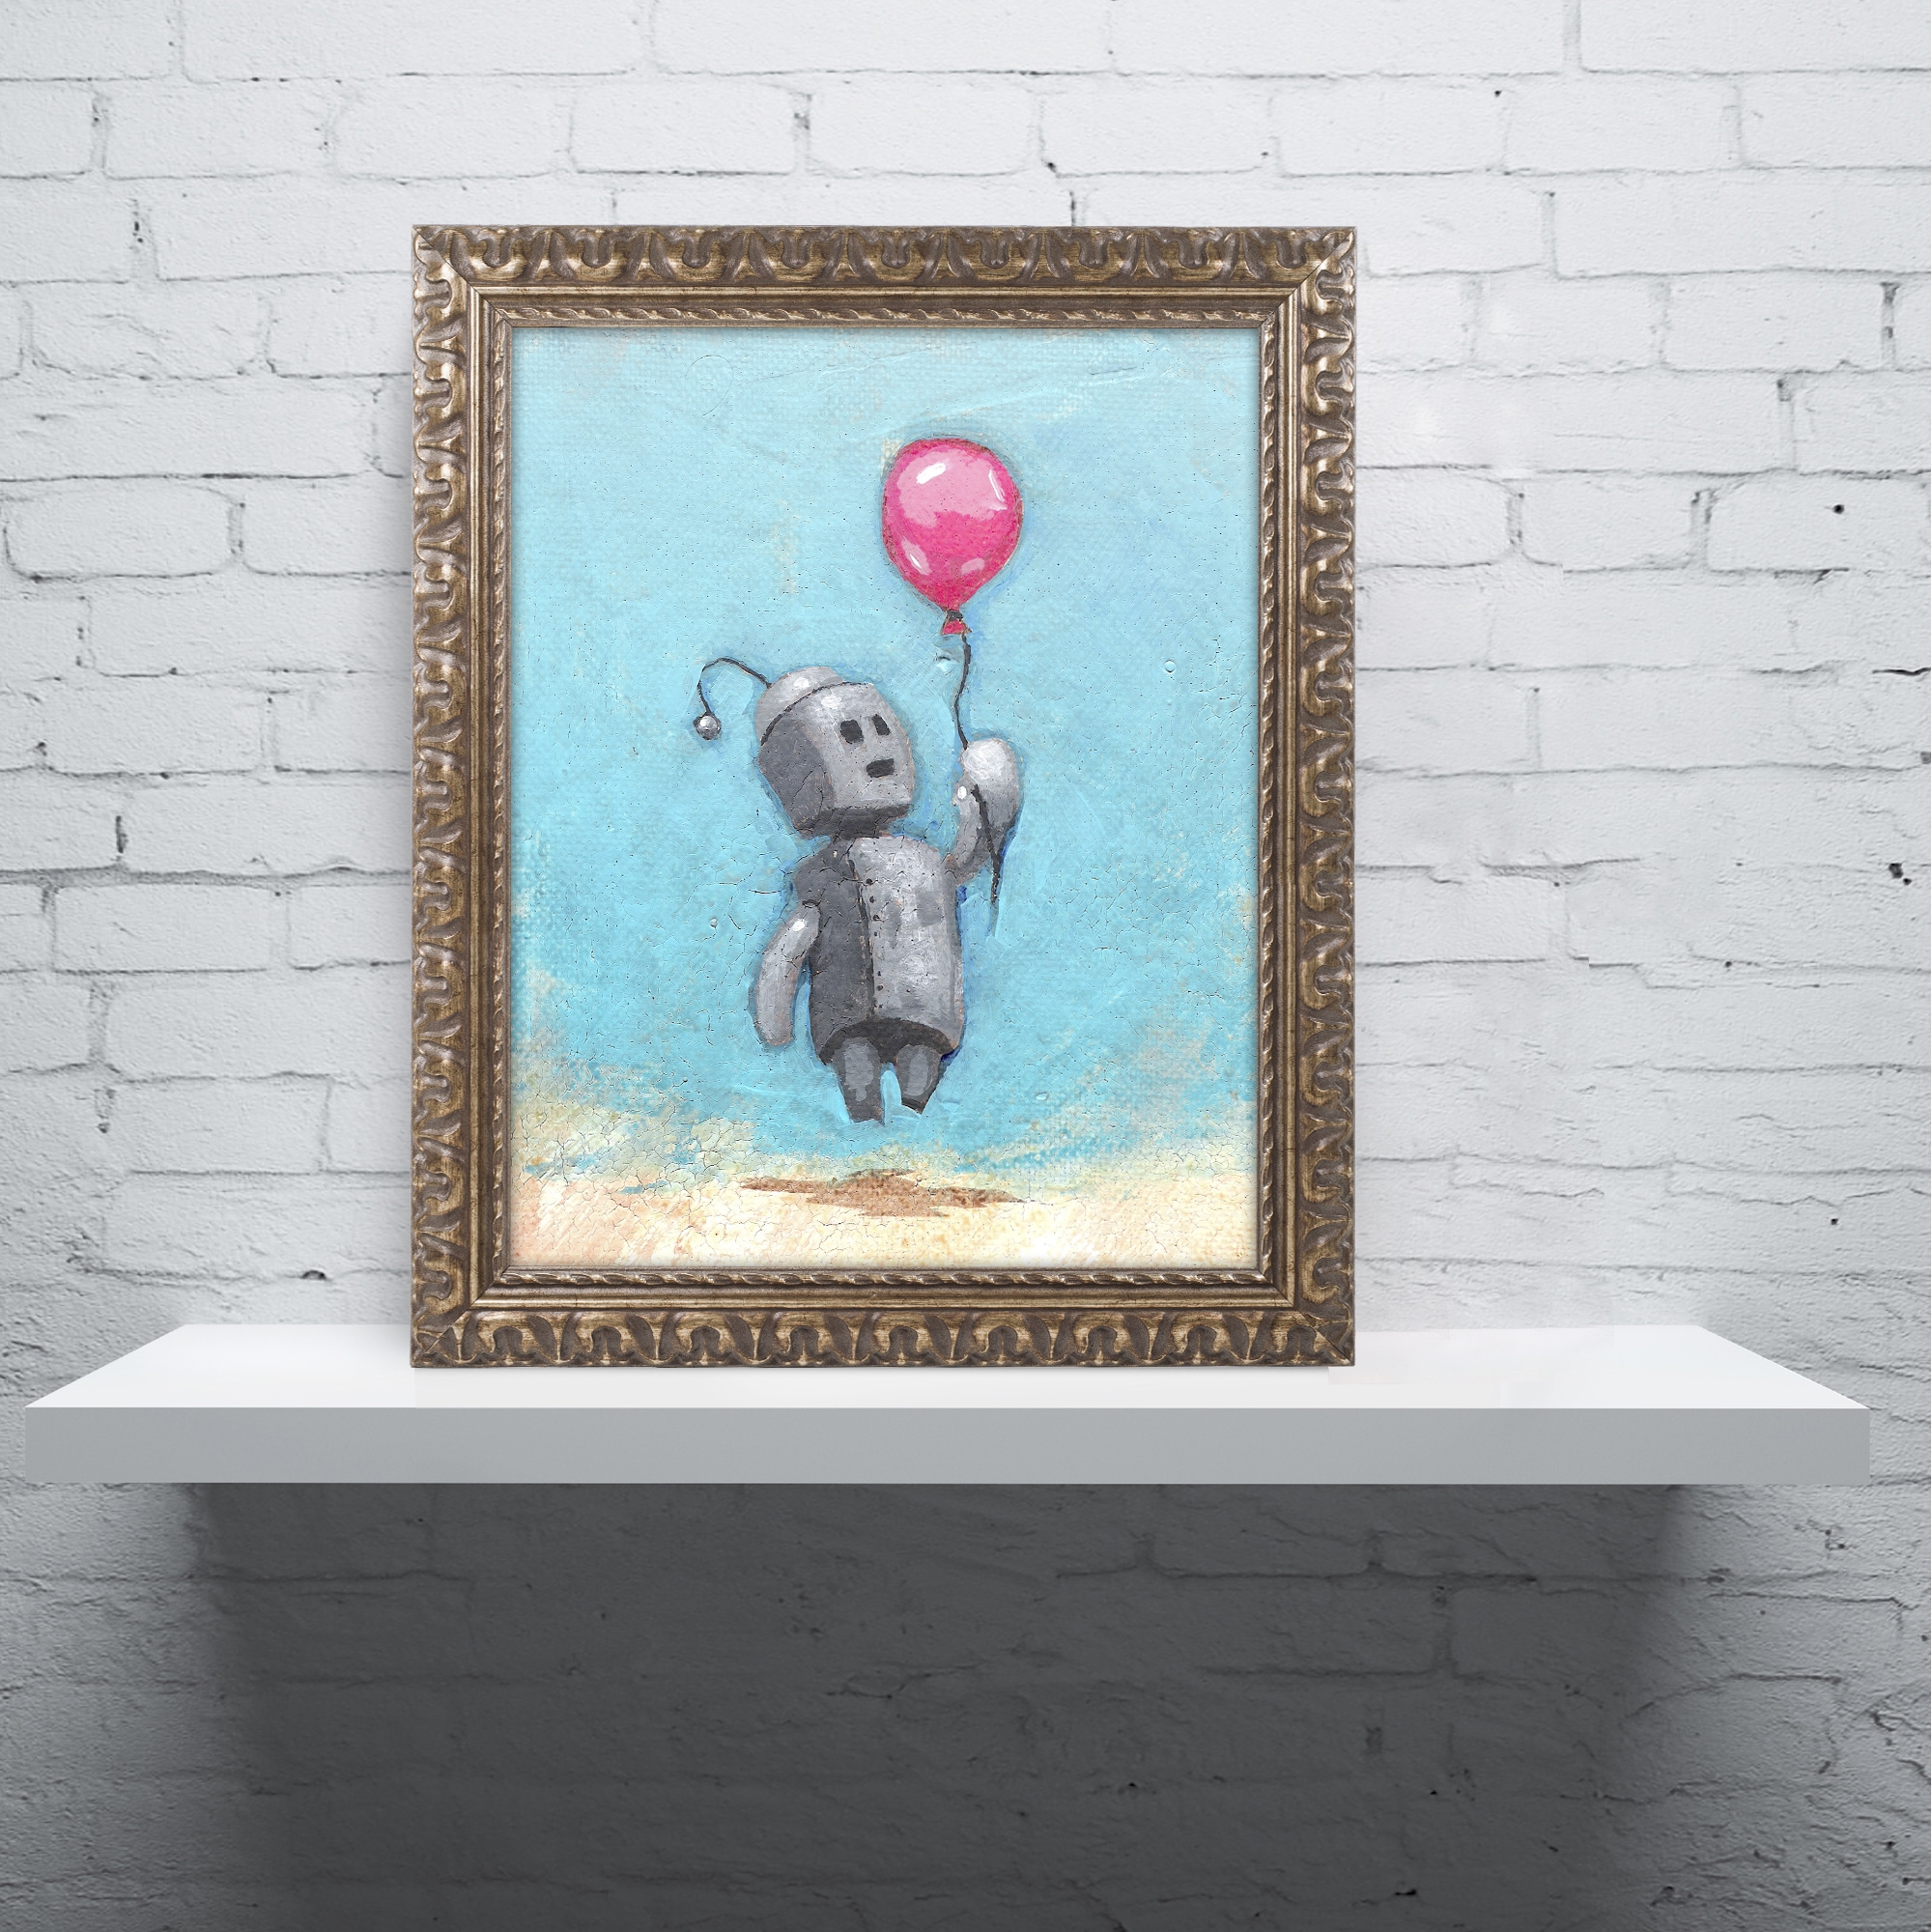 Shop Craig Snodgrass \'Robot With Red Balloon\' Ornate Framed Art - On ...